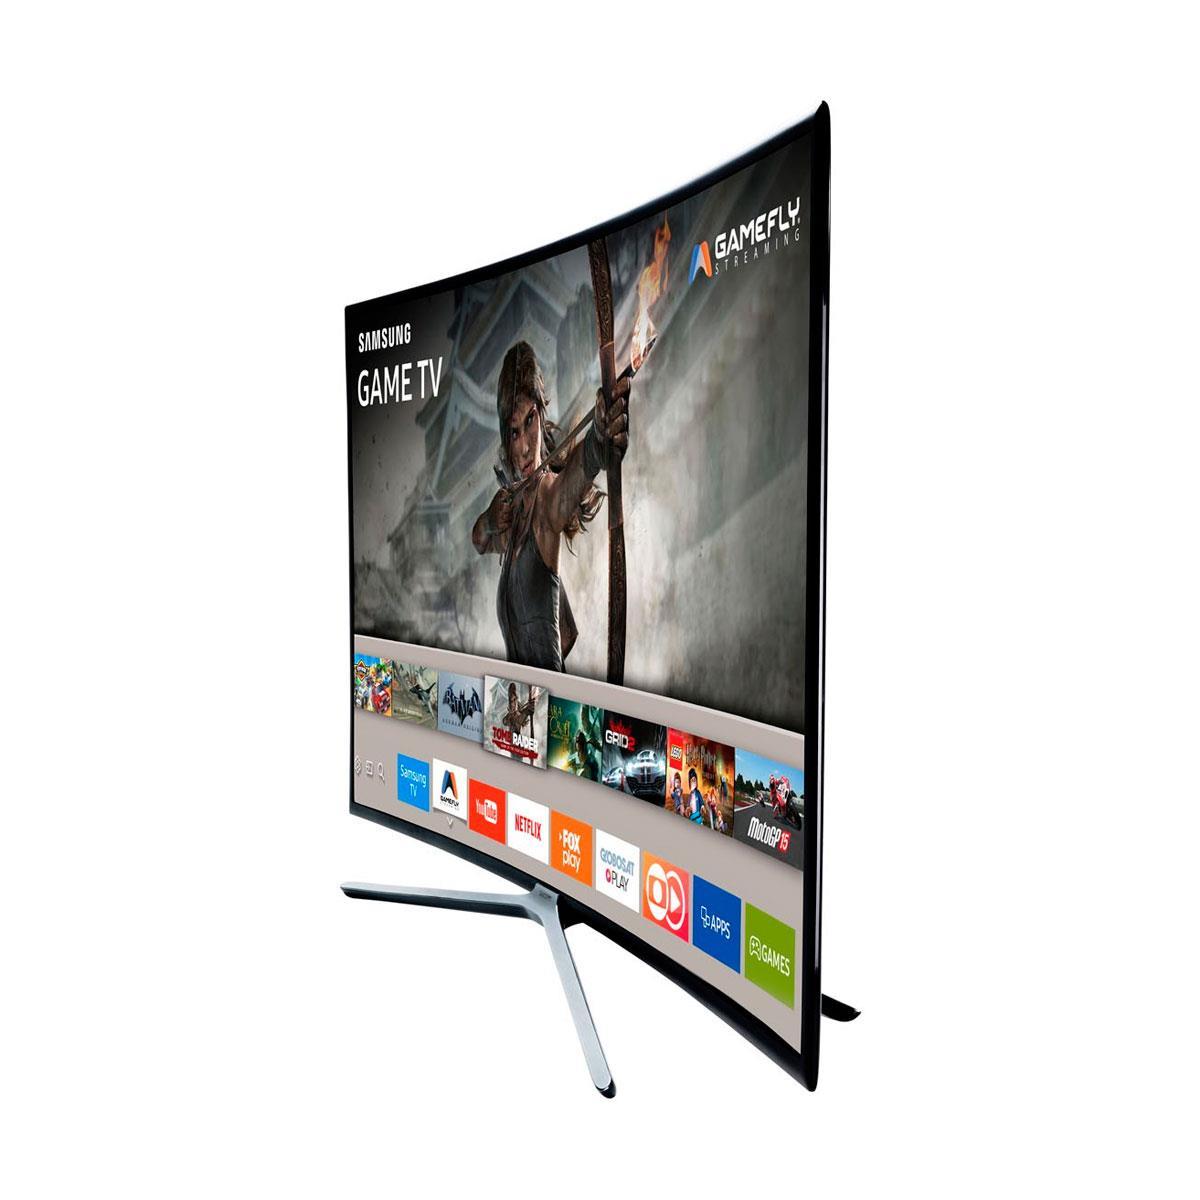 9506118a8 Smart TV Tela Curva LED Full HD Samsung K6500A Game TV com Wi-Fi ...